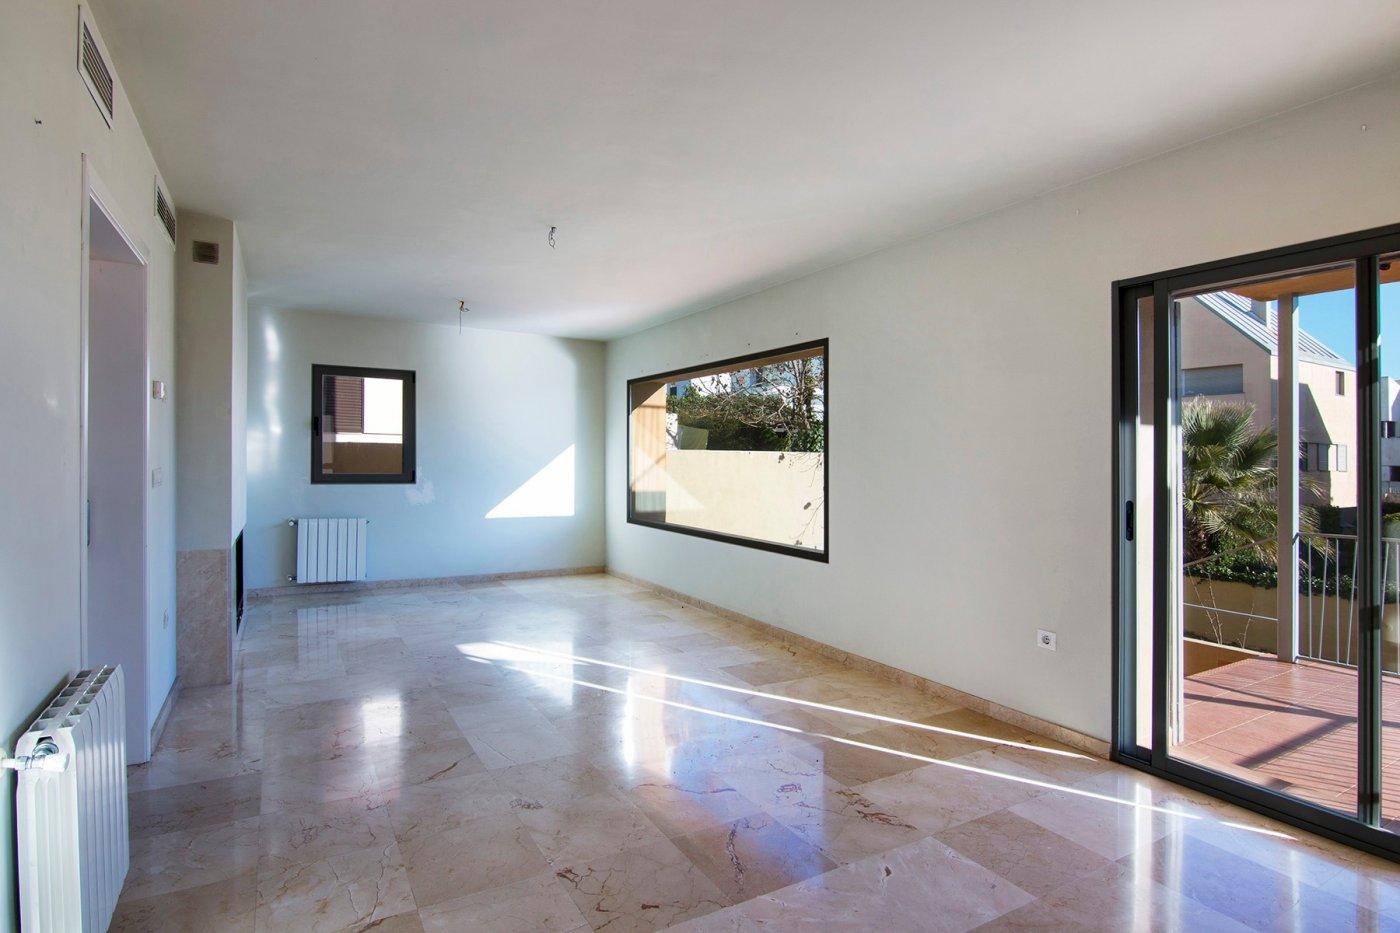 Estupenda casa prácticamente a estrenar en Loma Verde, Granada